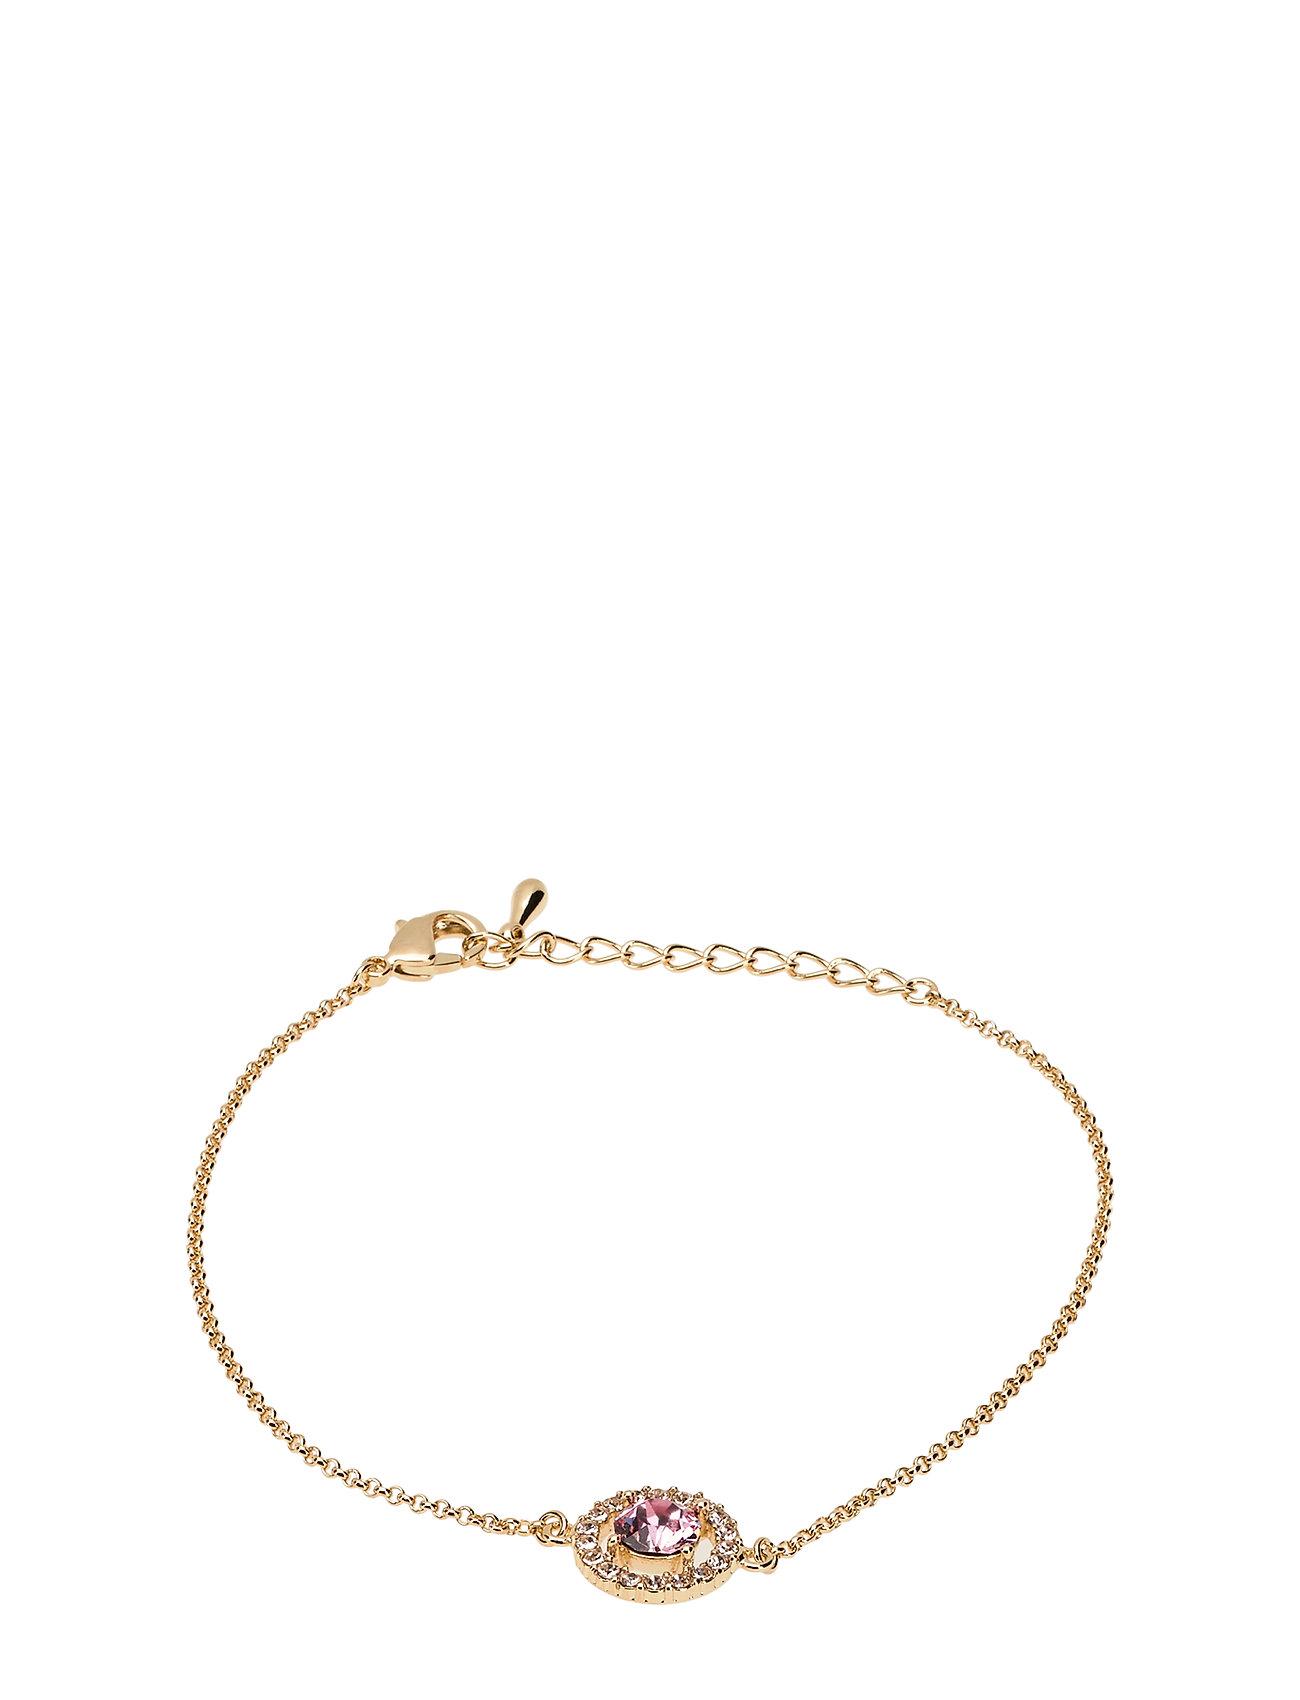 Image of Miss Miranda Bracelet - Light Rose Accessories Jewellery Bracelets Chain Bracelets Guld LILY AND ROSE (3308423581)